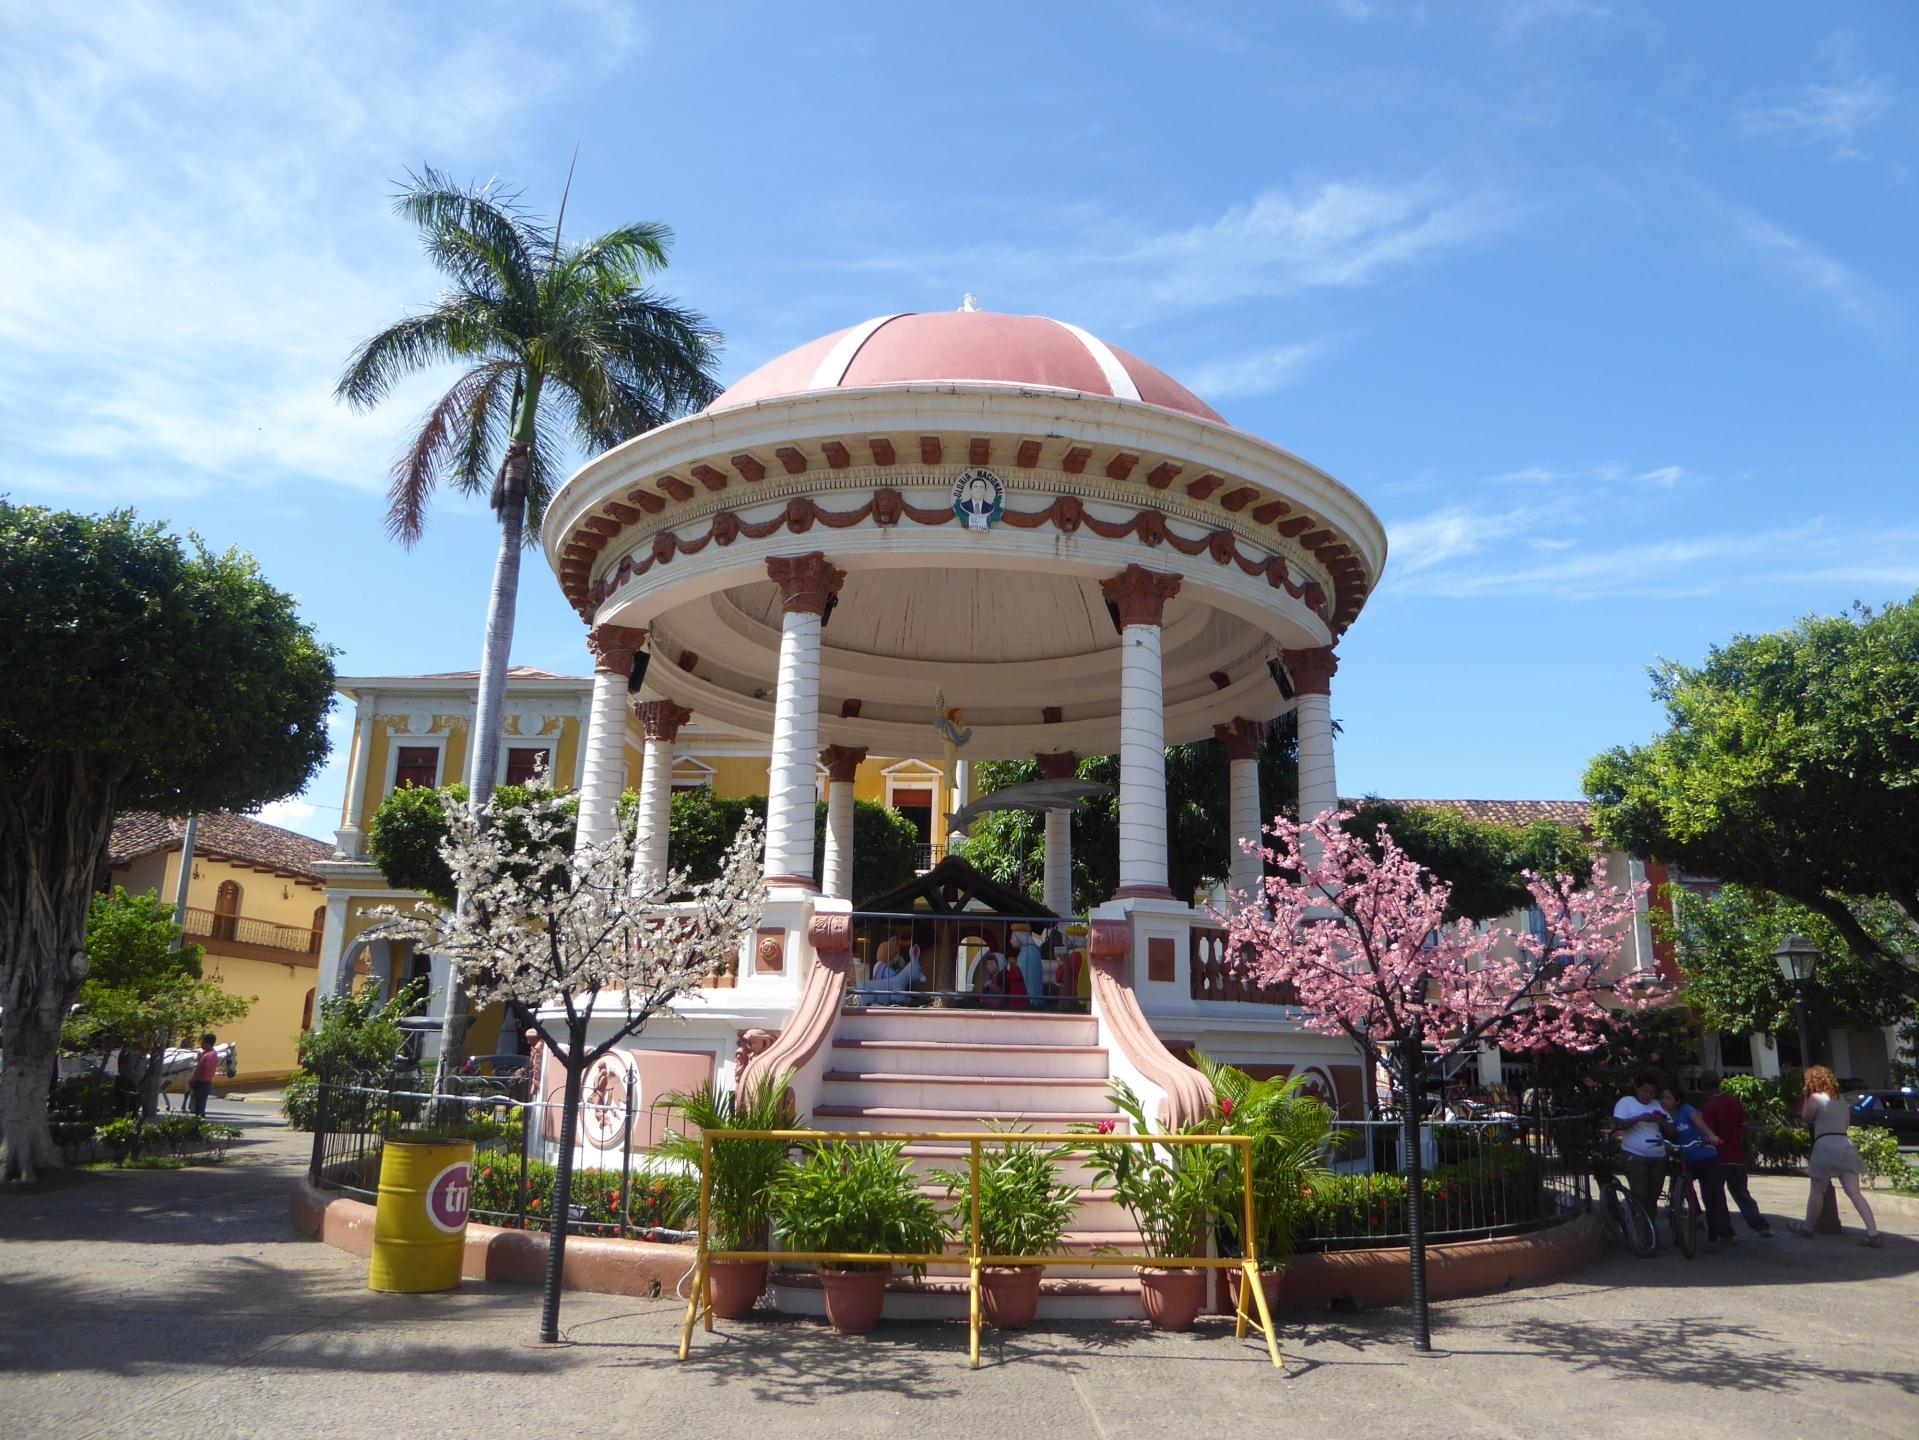 granada nicaragua church cathedral plaza